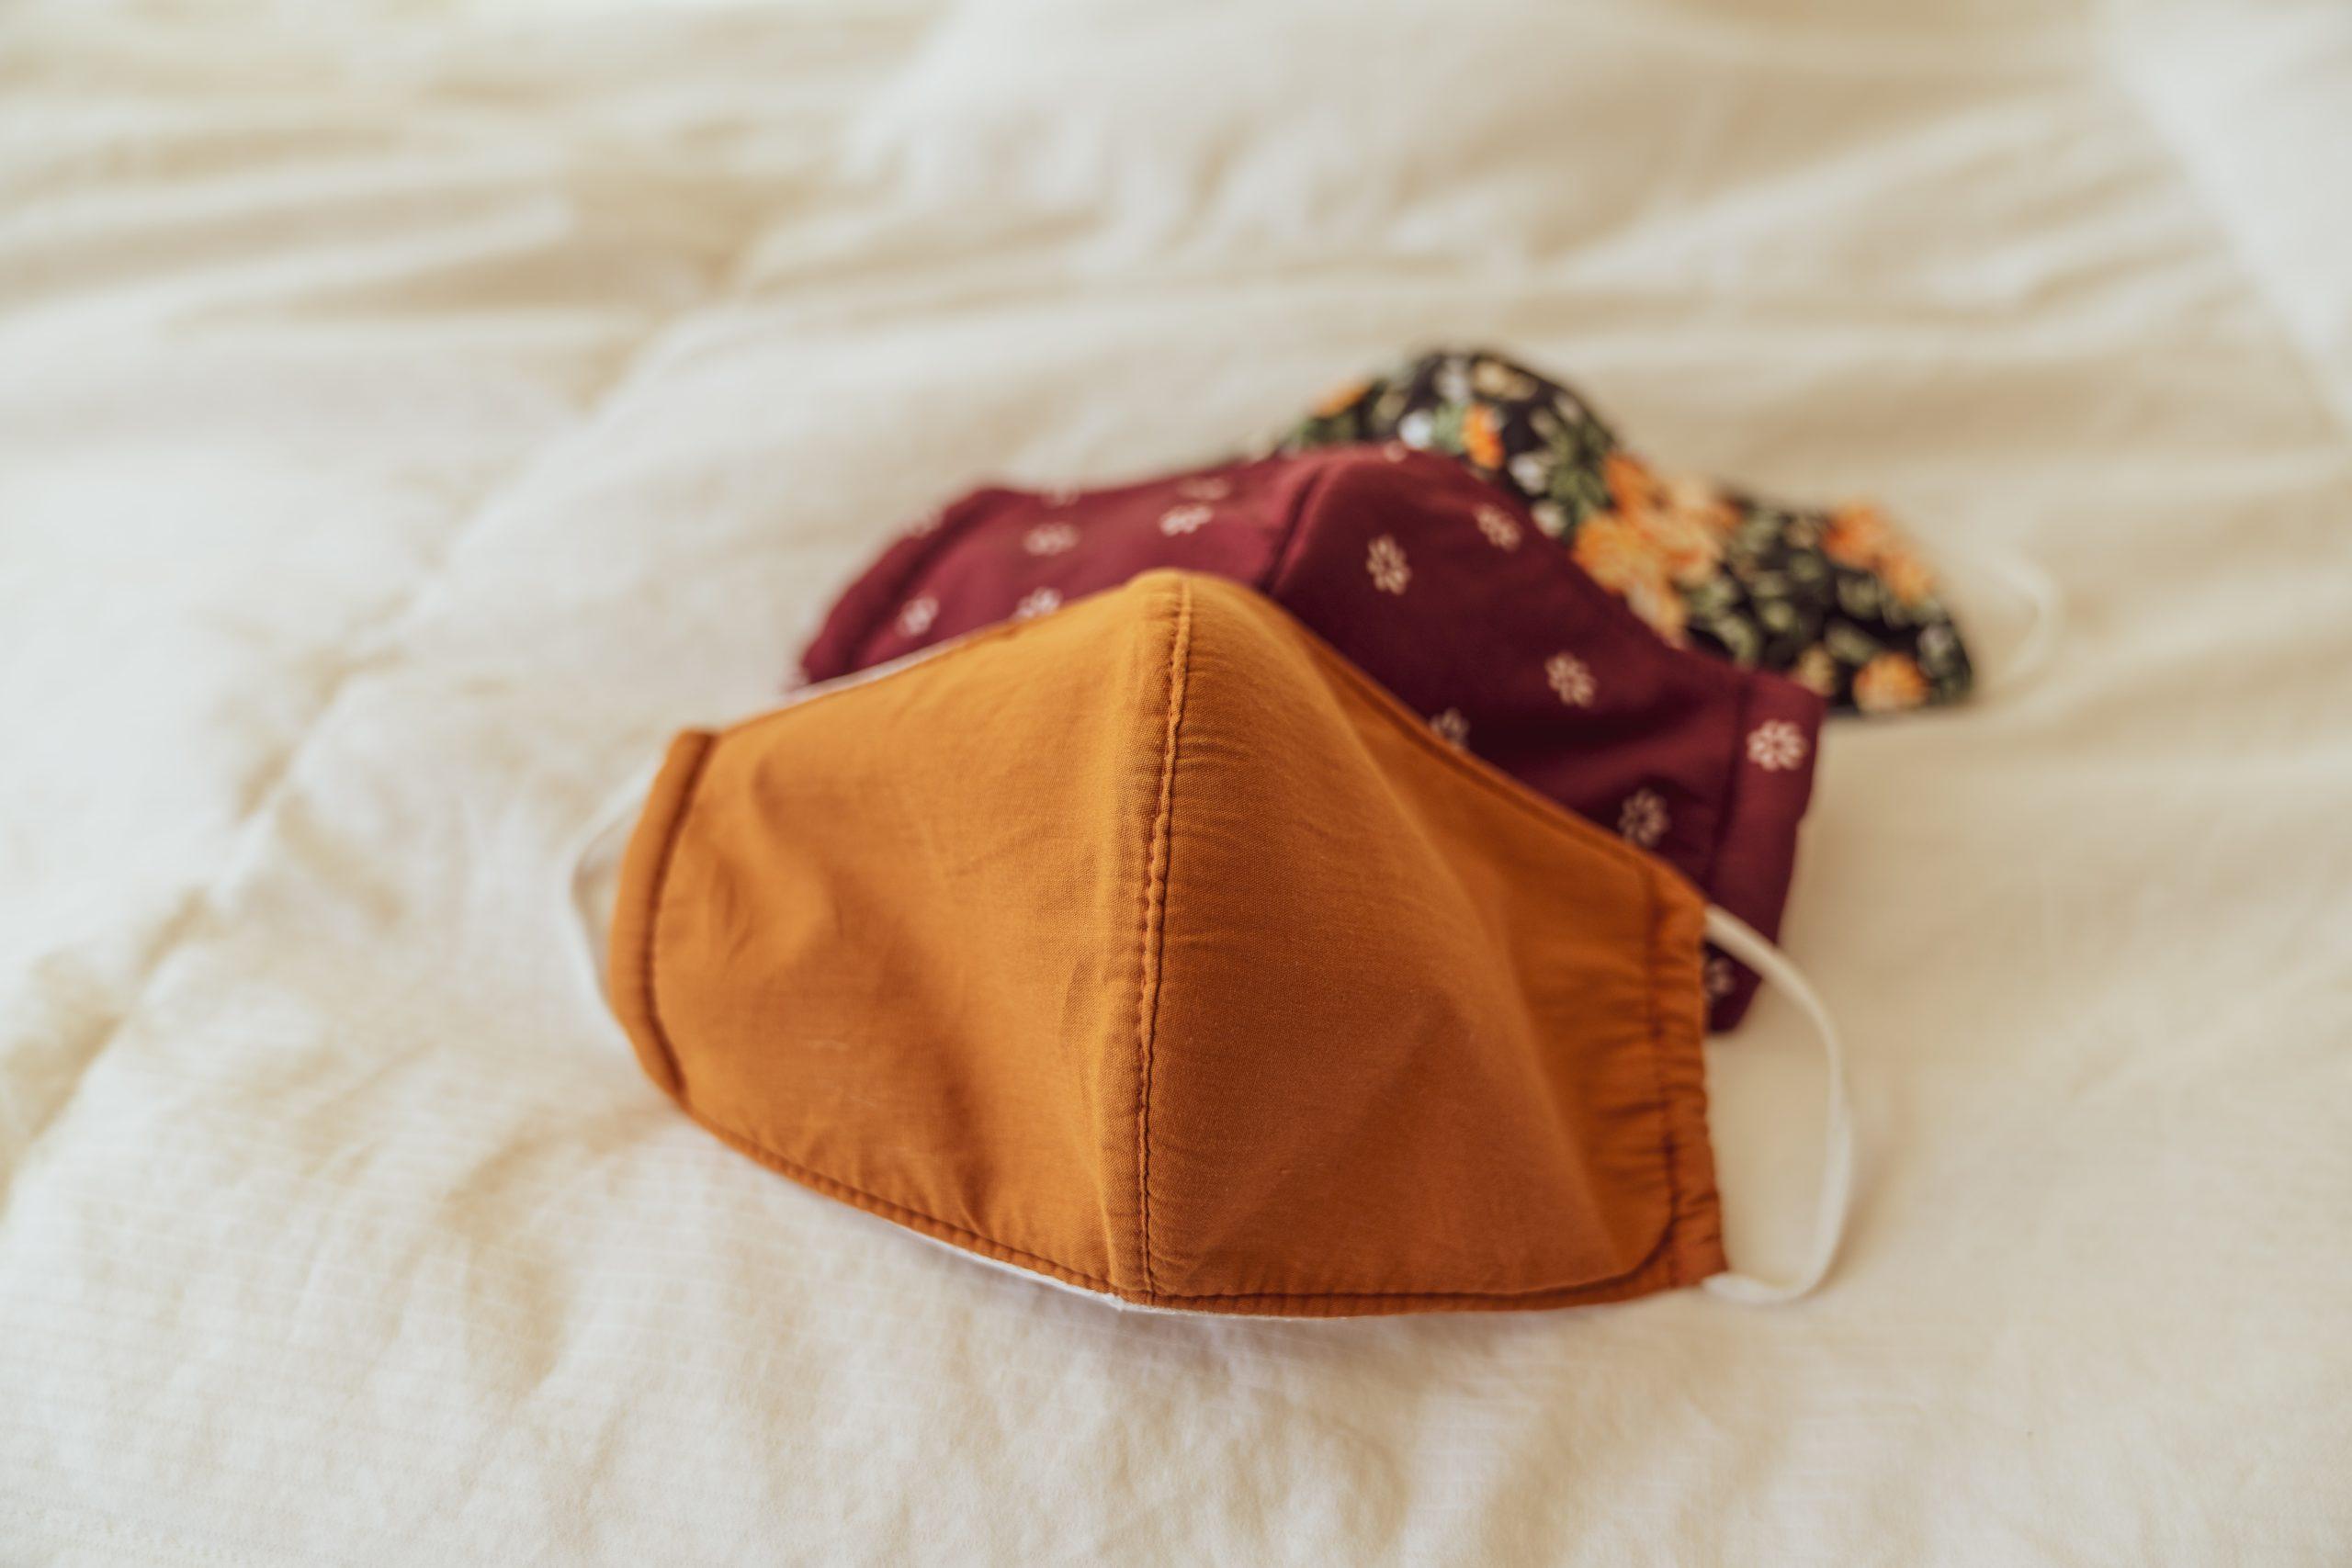 10 Best Handmade COVID Face Masks